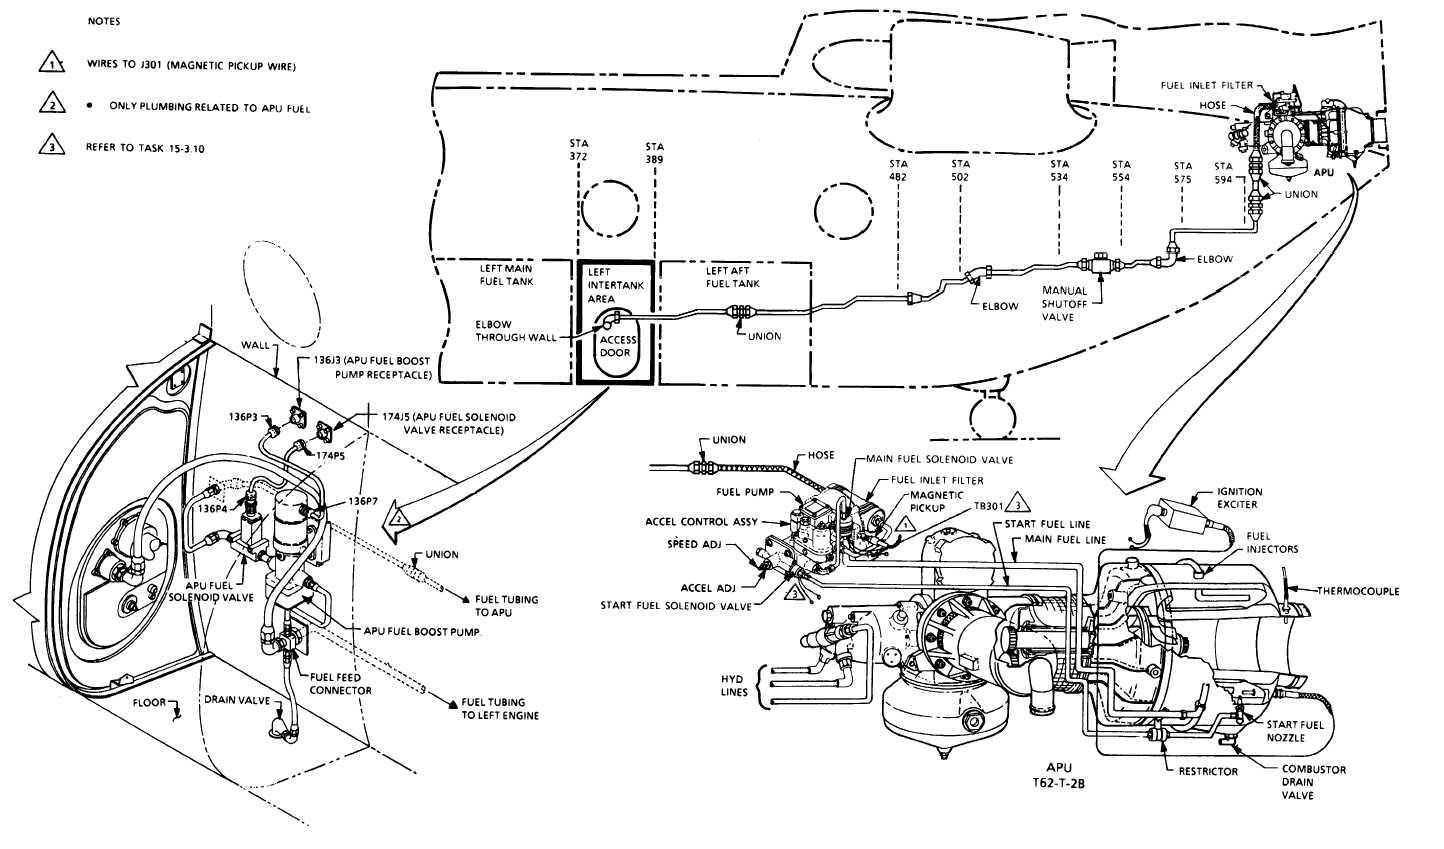 Apu Fuel System Piping Diagram